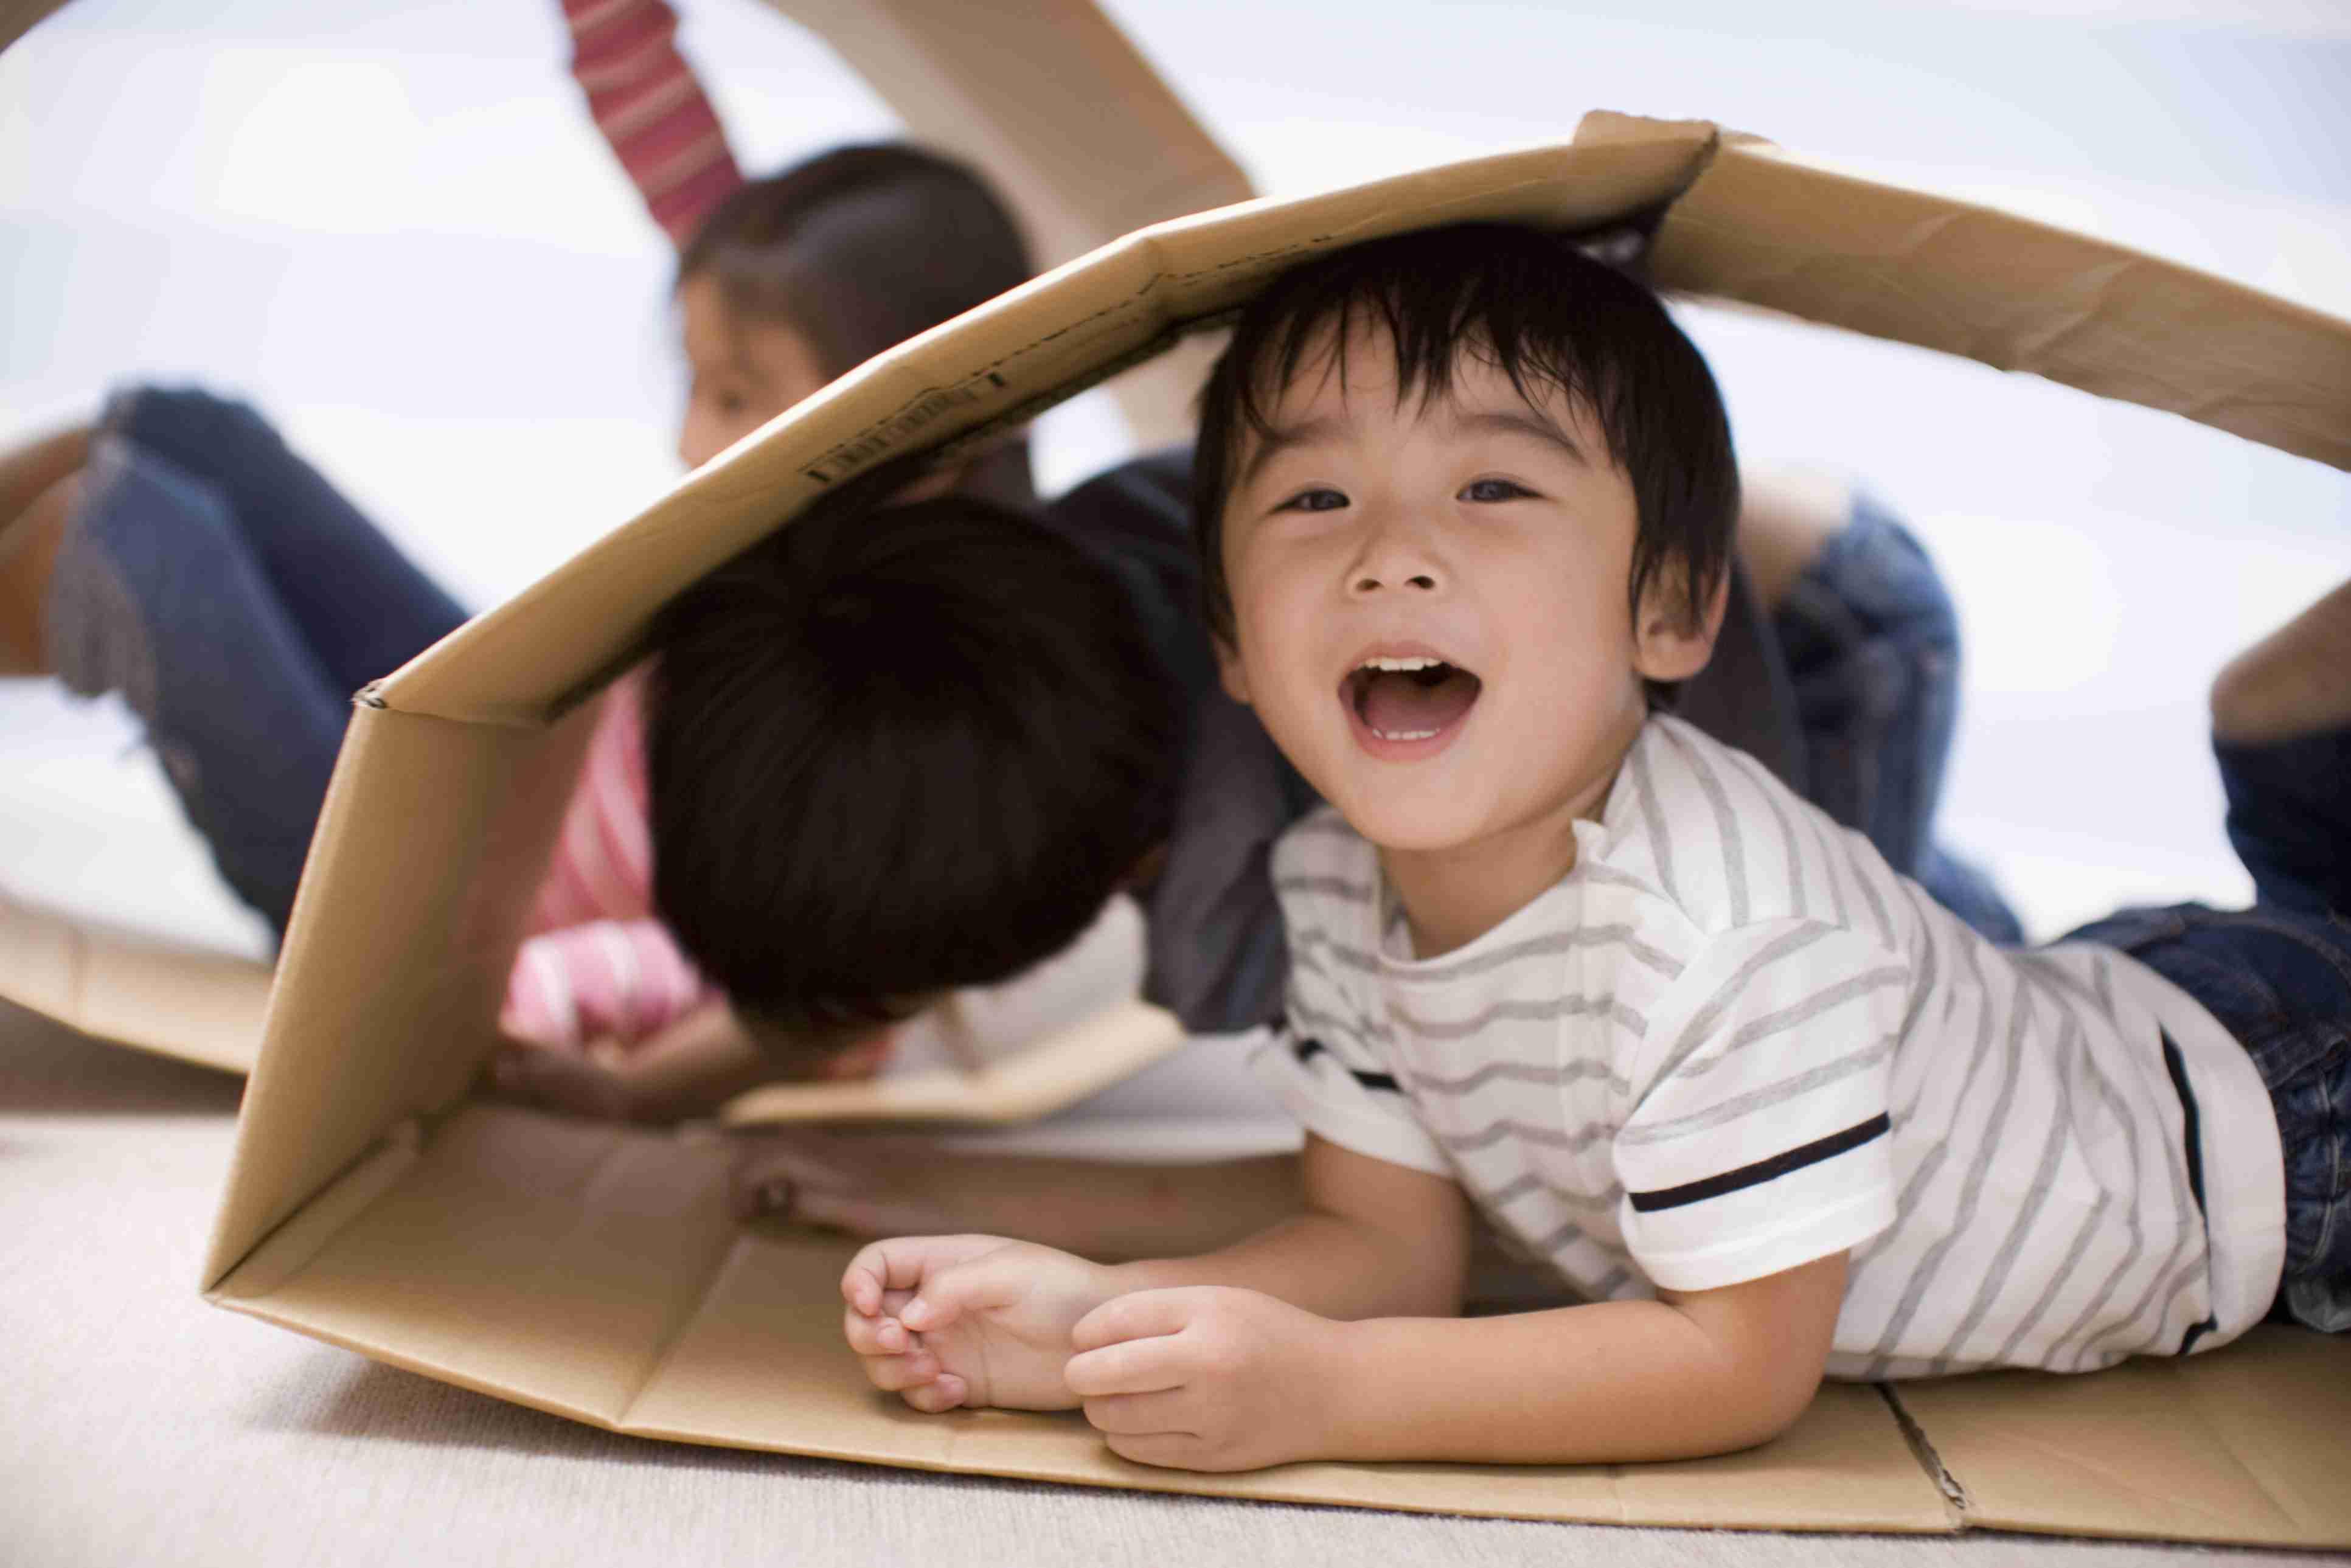 Cardboard crafts - kids make a tunnel